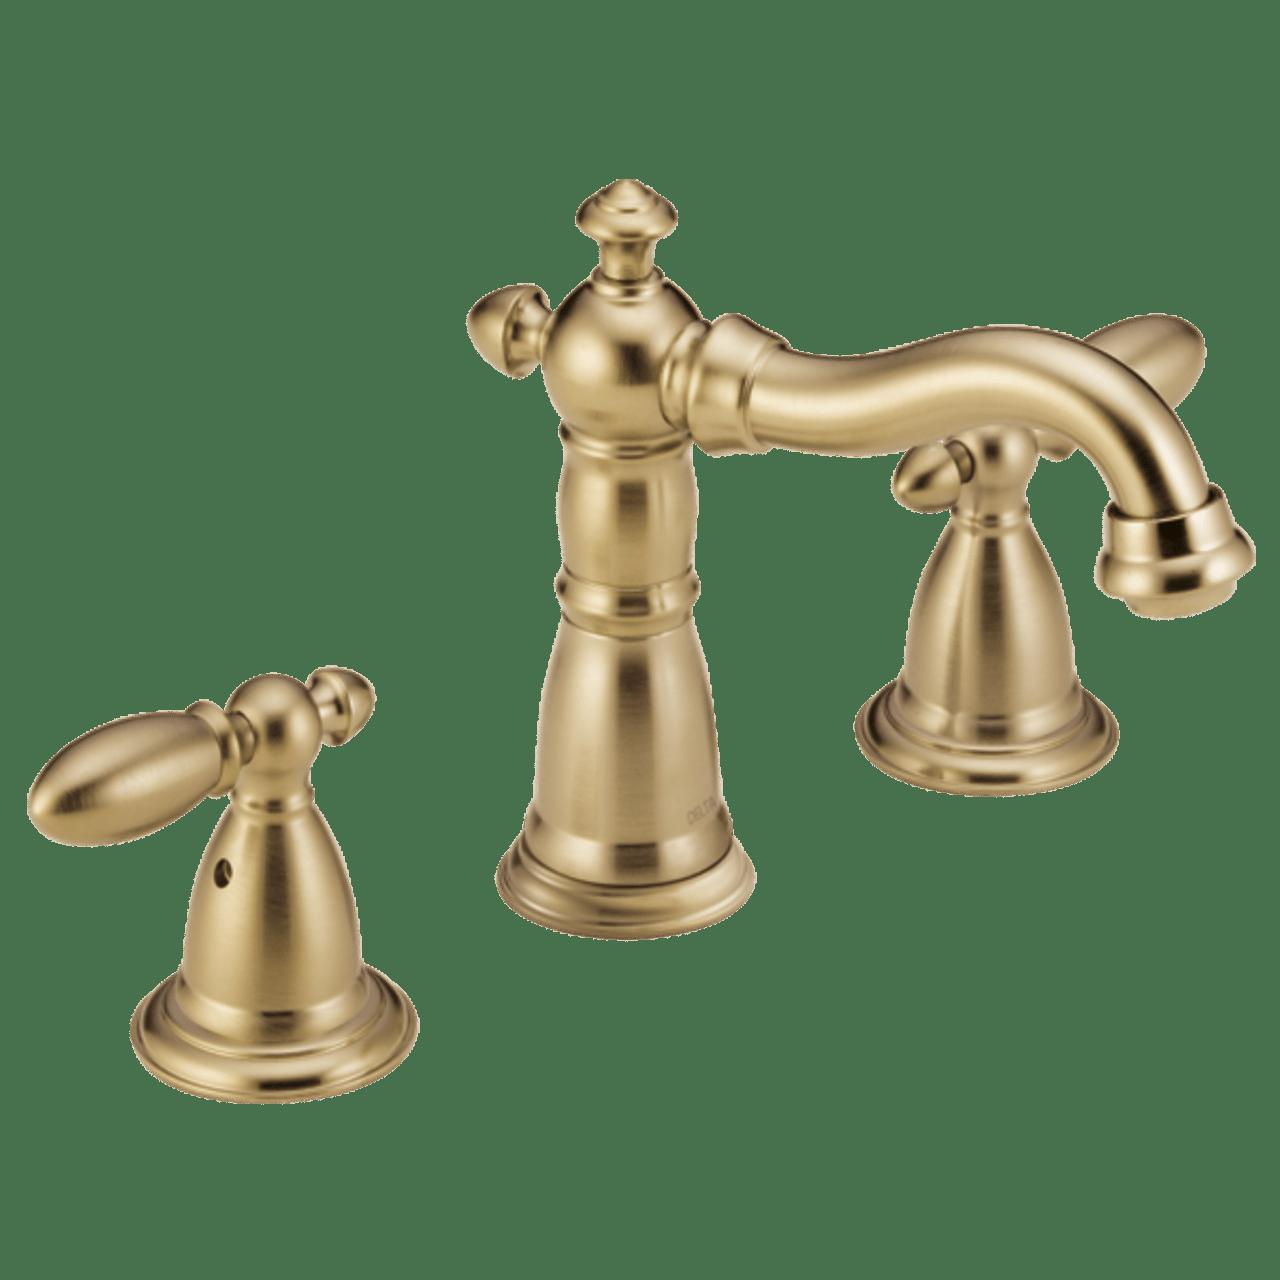 delta victorian two handle widespread lavatory faucet champagne bronze